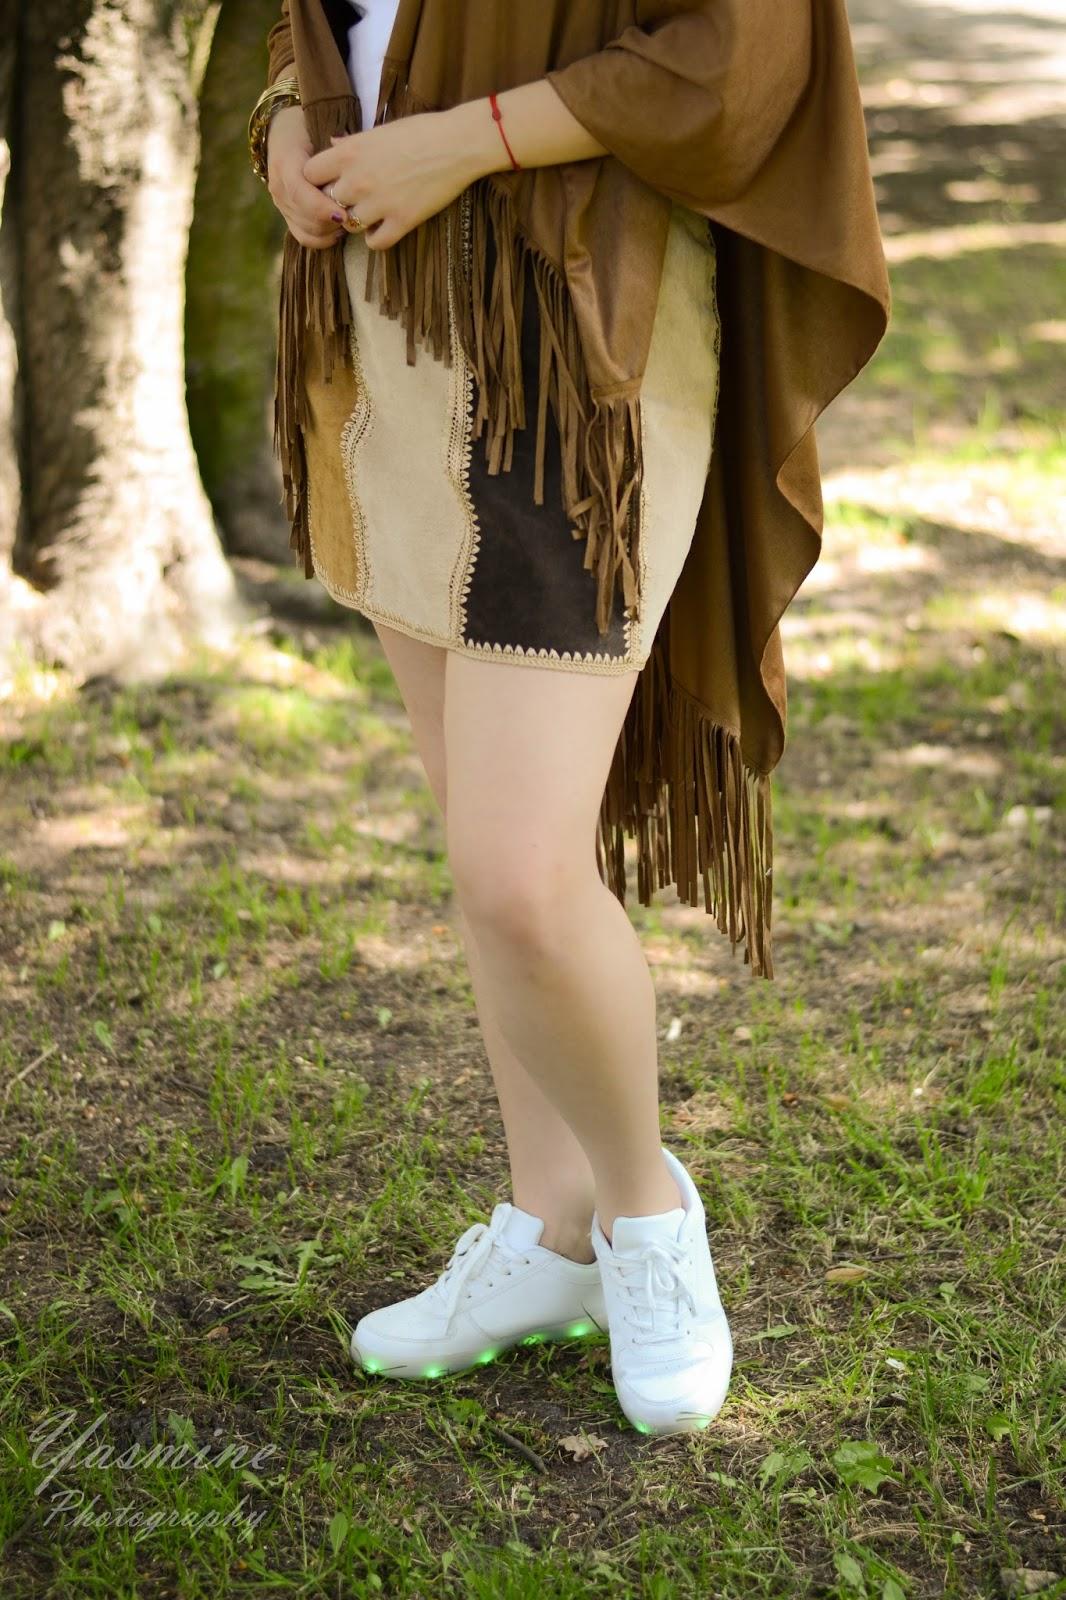 4 coachella boho style etno summer sommer festival indie jewellery stylizacja na festiwal festival coachella poland polish blogger sommer summer style fashion moda inspiration melodylaniella boho style